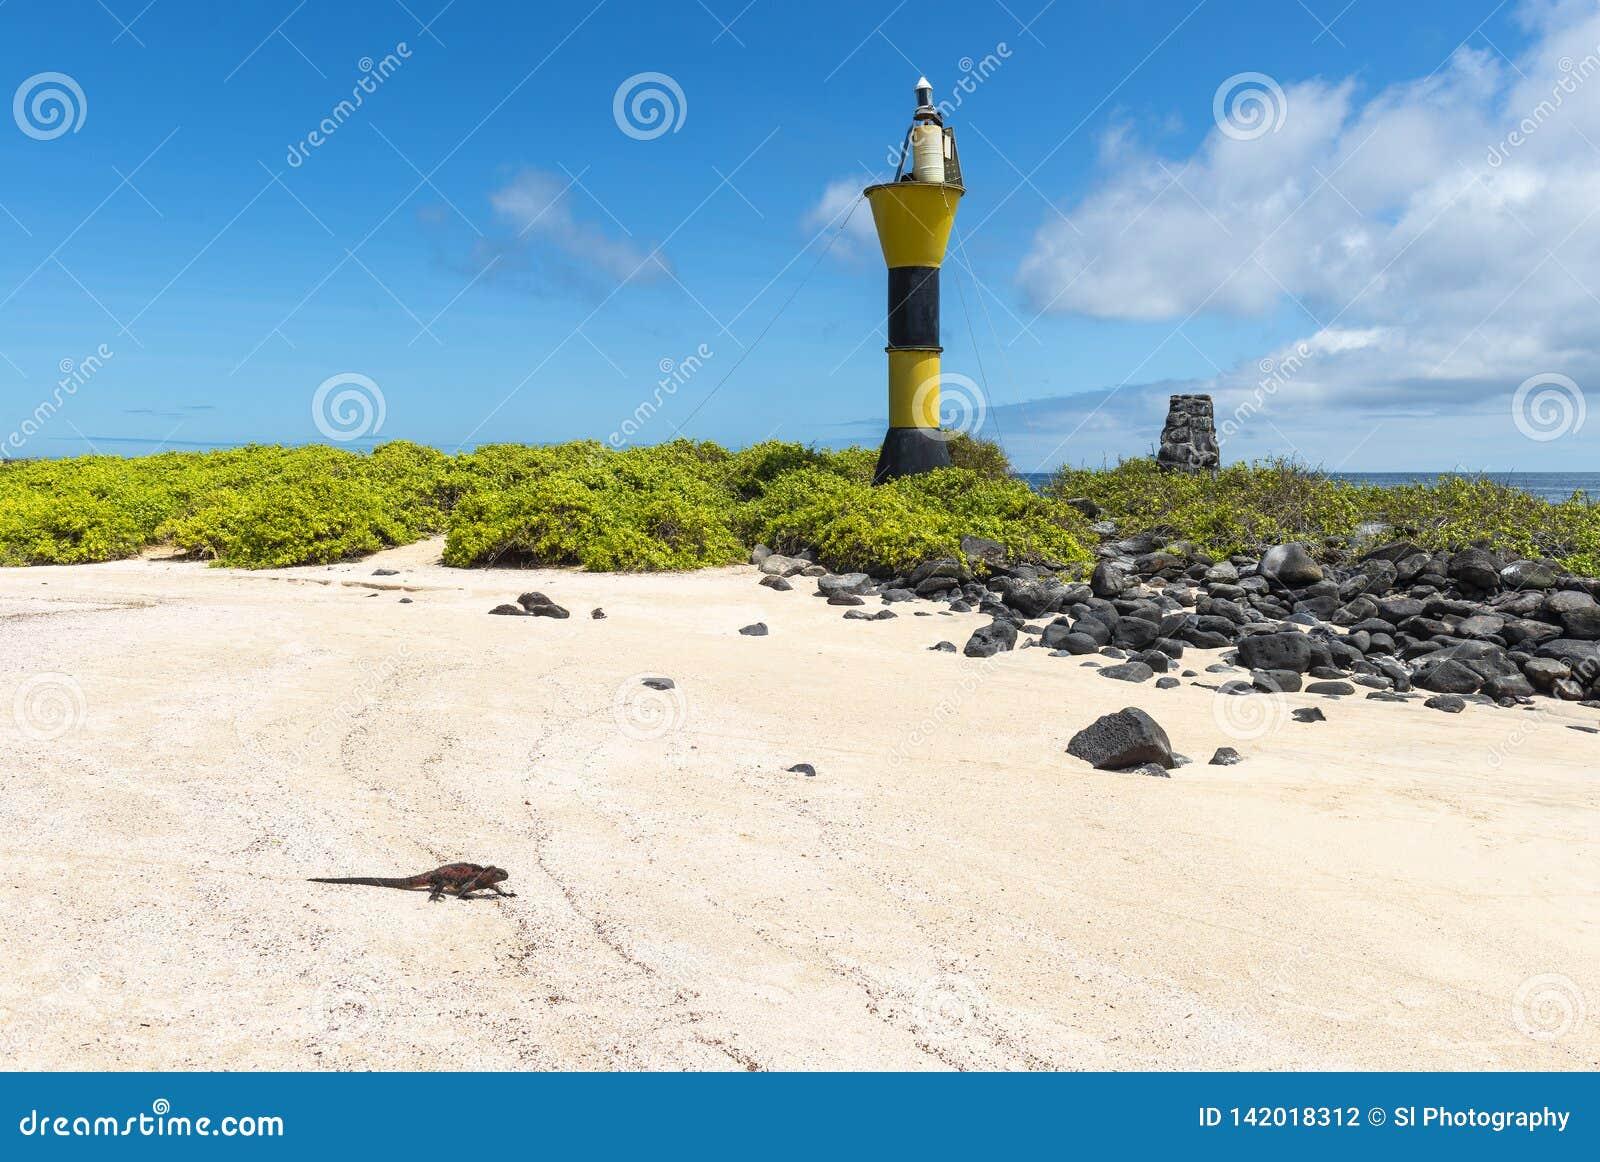 Latarnia morska na Espanola wyspie, Galapagos, Ekwador